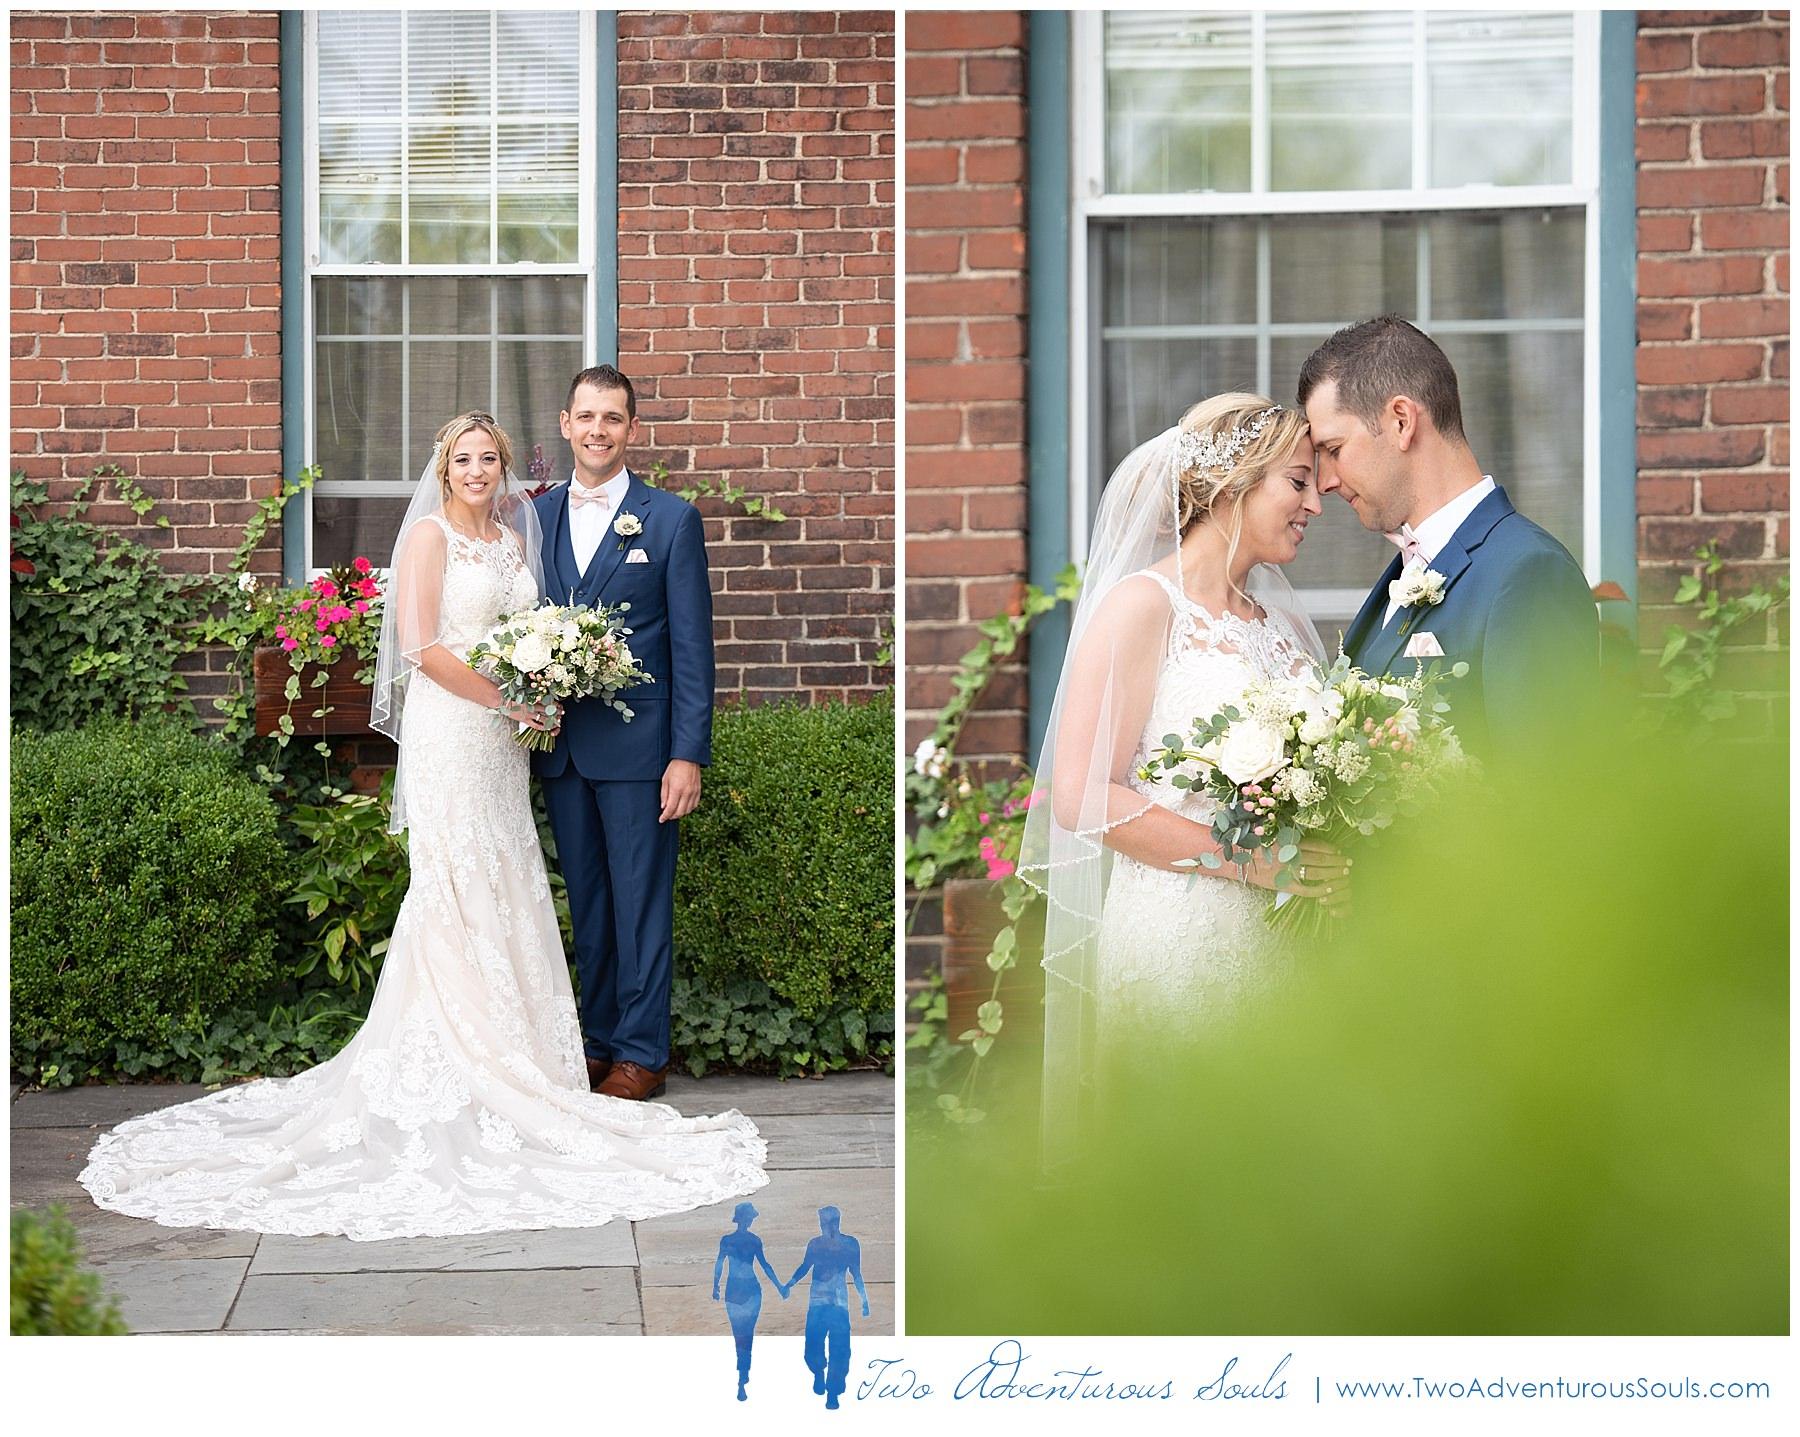 Connecticut Wedding Photographers, Lace Factory Wedding Photographers, Two Adventurous Souls - 083119_0028.jpg